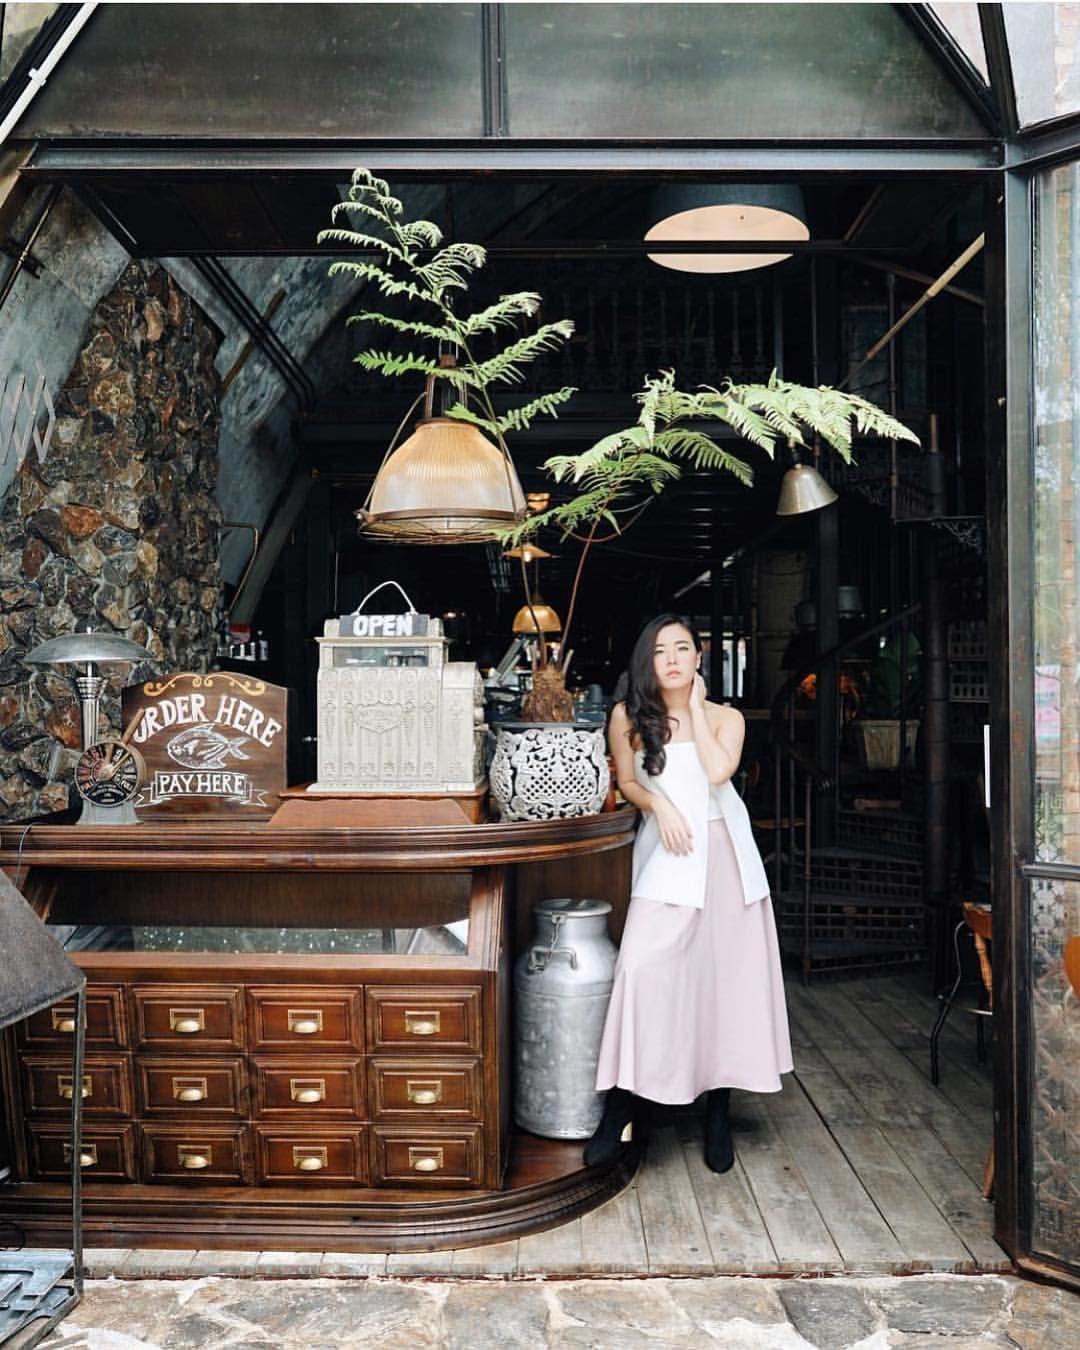 Pompano Roasted Cafe, Bangkok at The Camp Vintage Flea Market ...